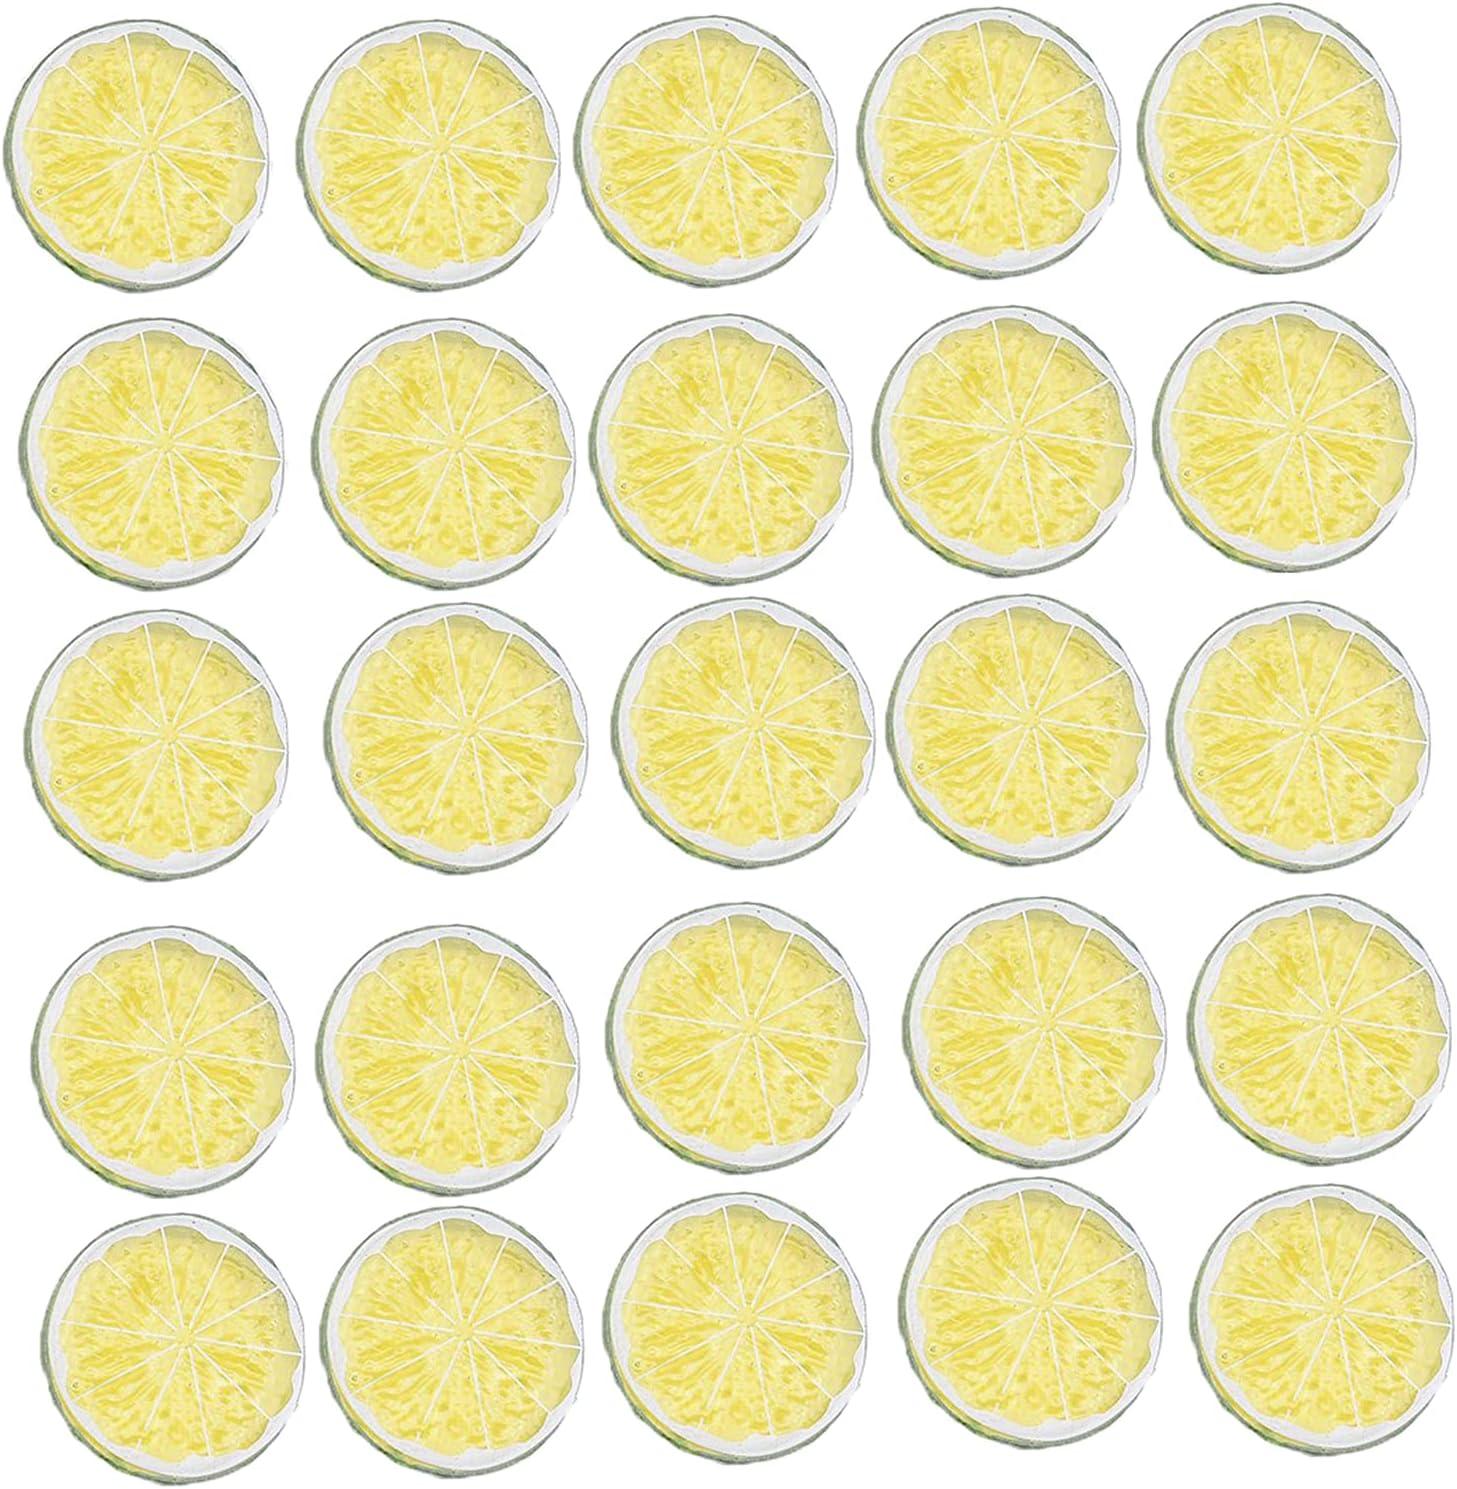 25 Pcs Simulation Lemon High material Slices Fake Fruit Artificial outlet Party Model